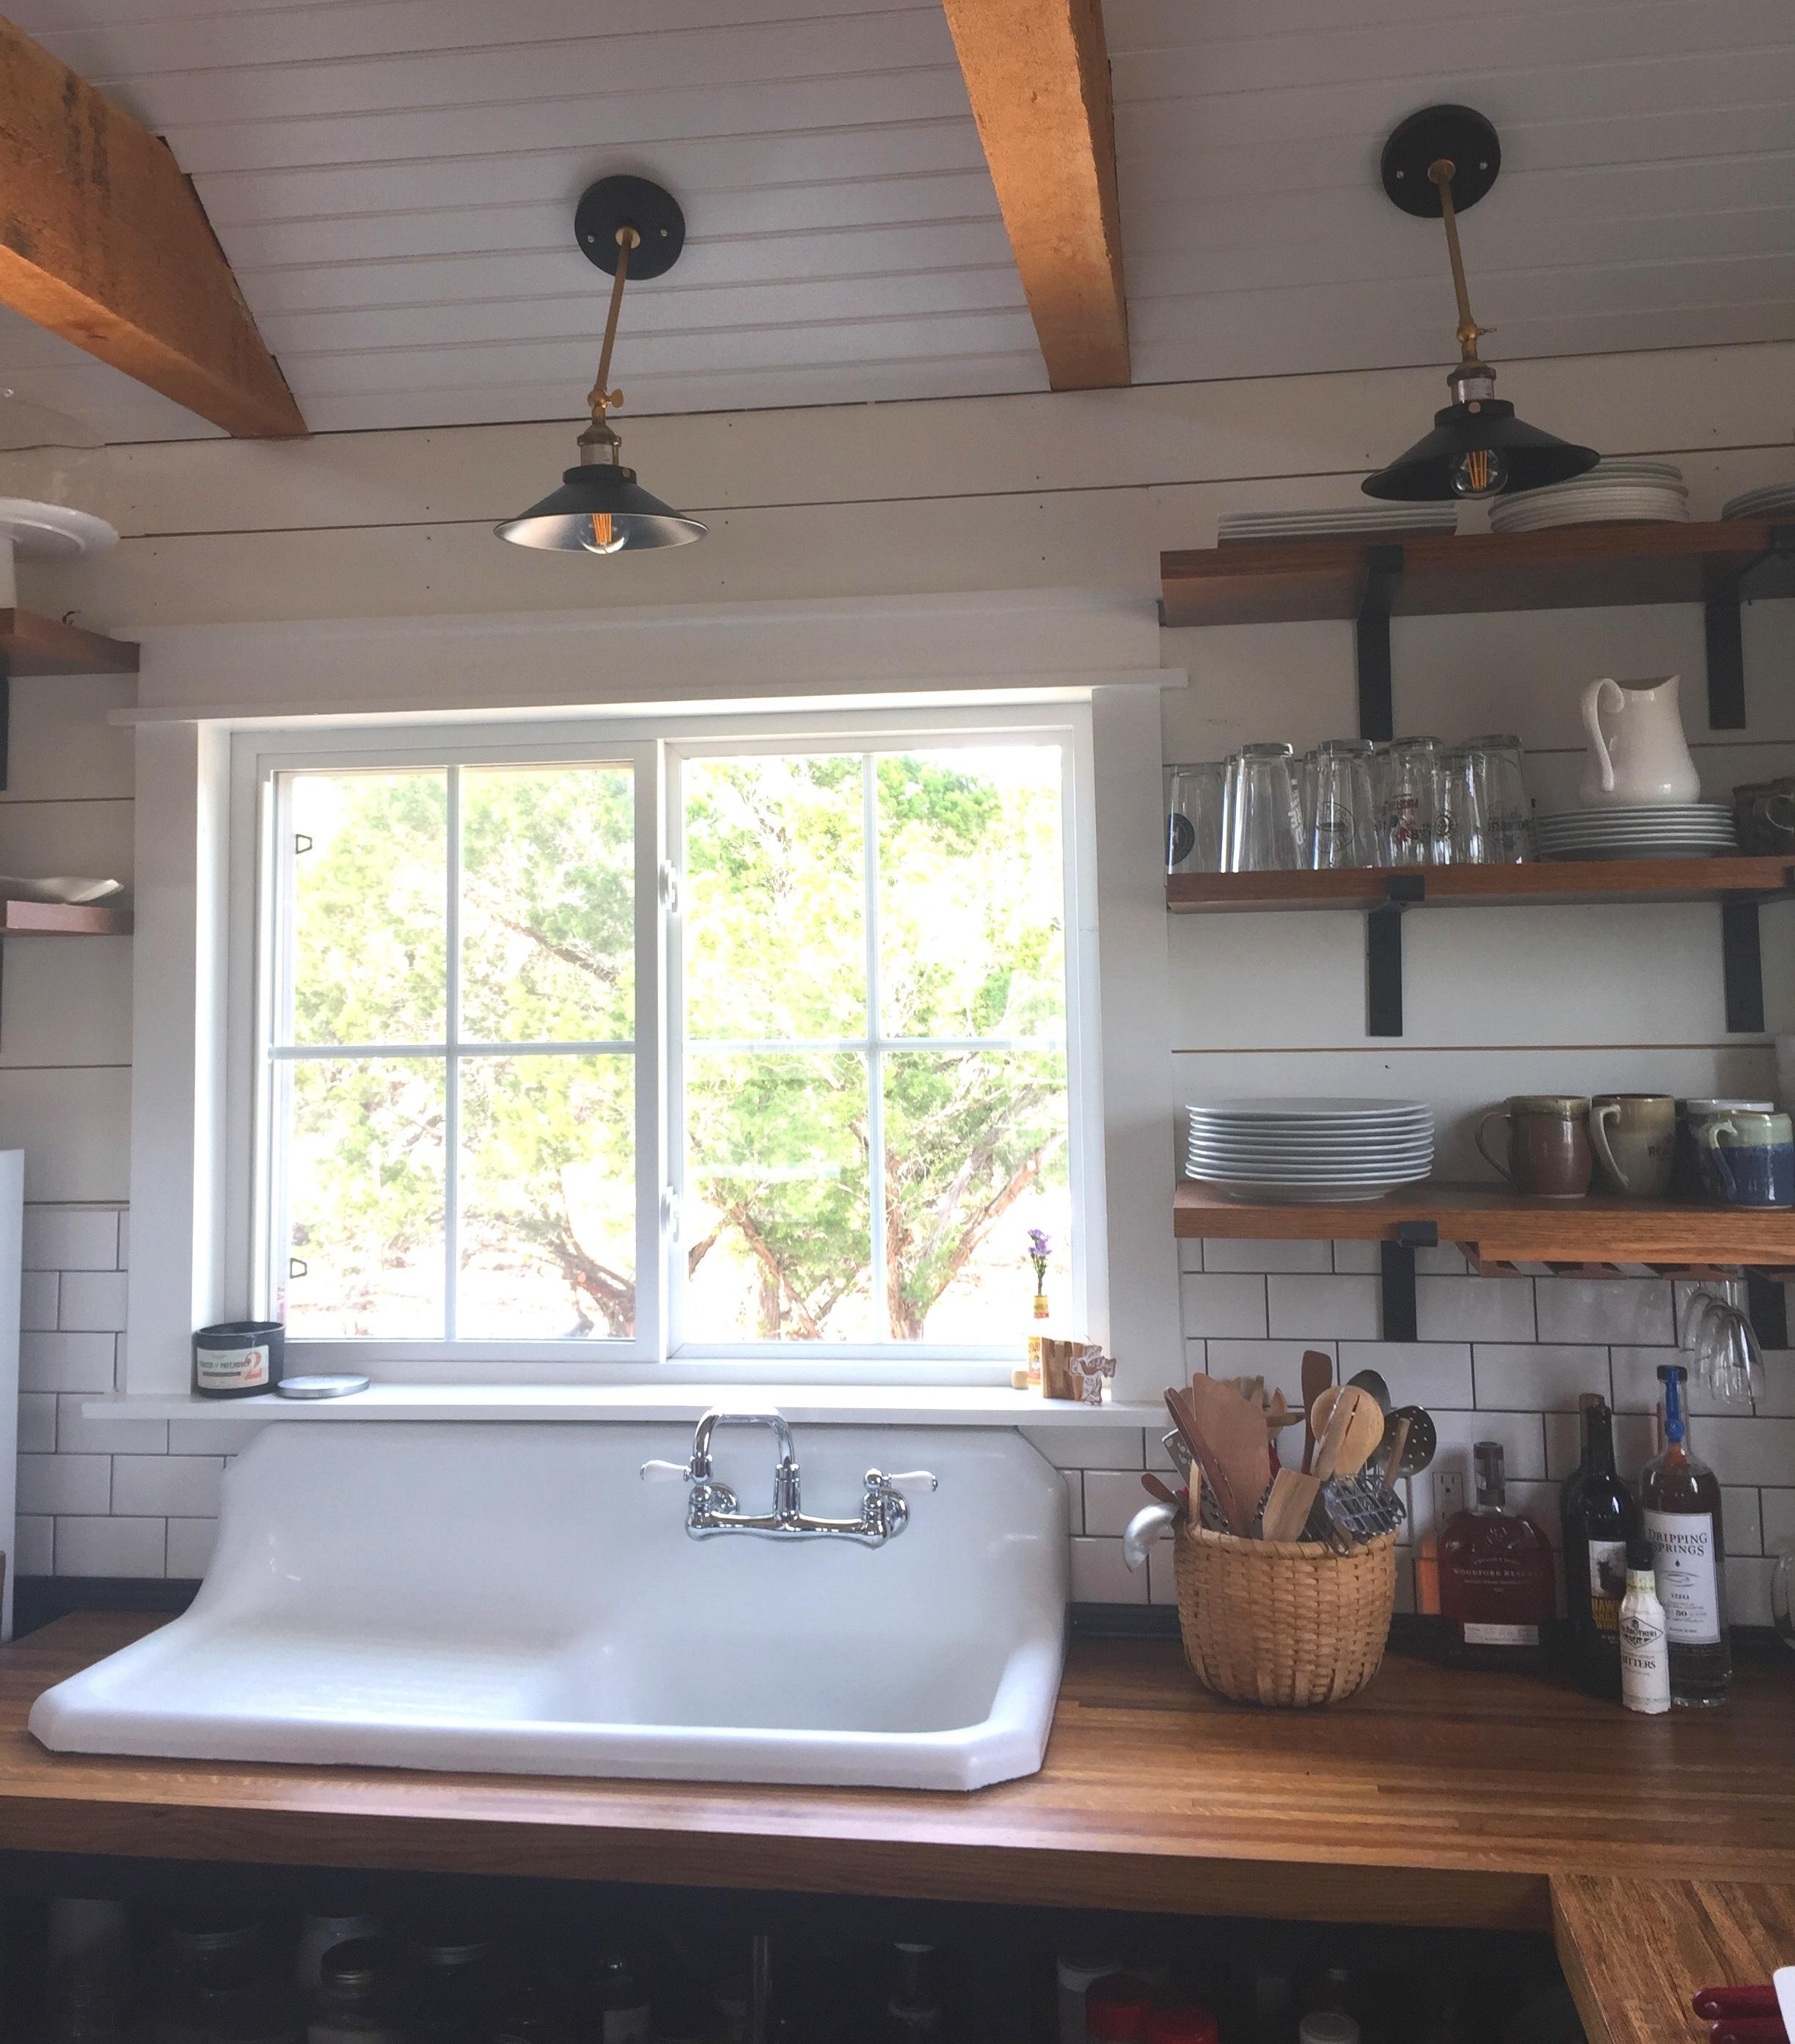 Farmhouse sink with drain board